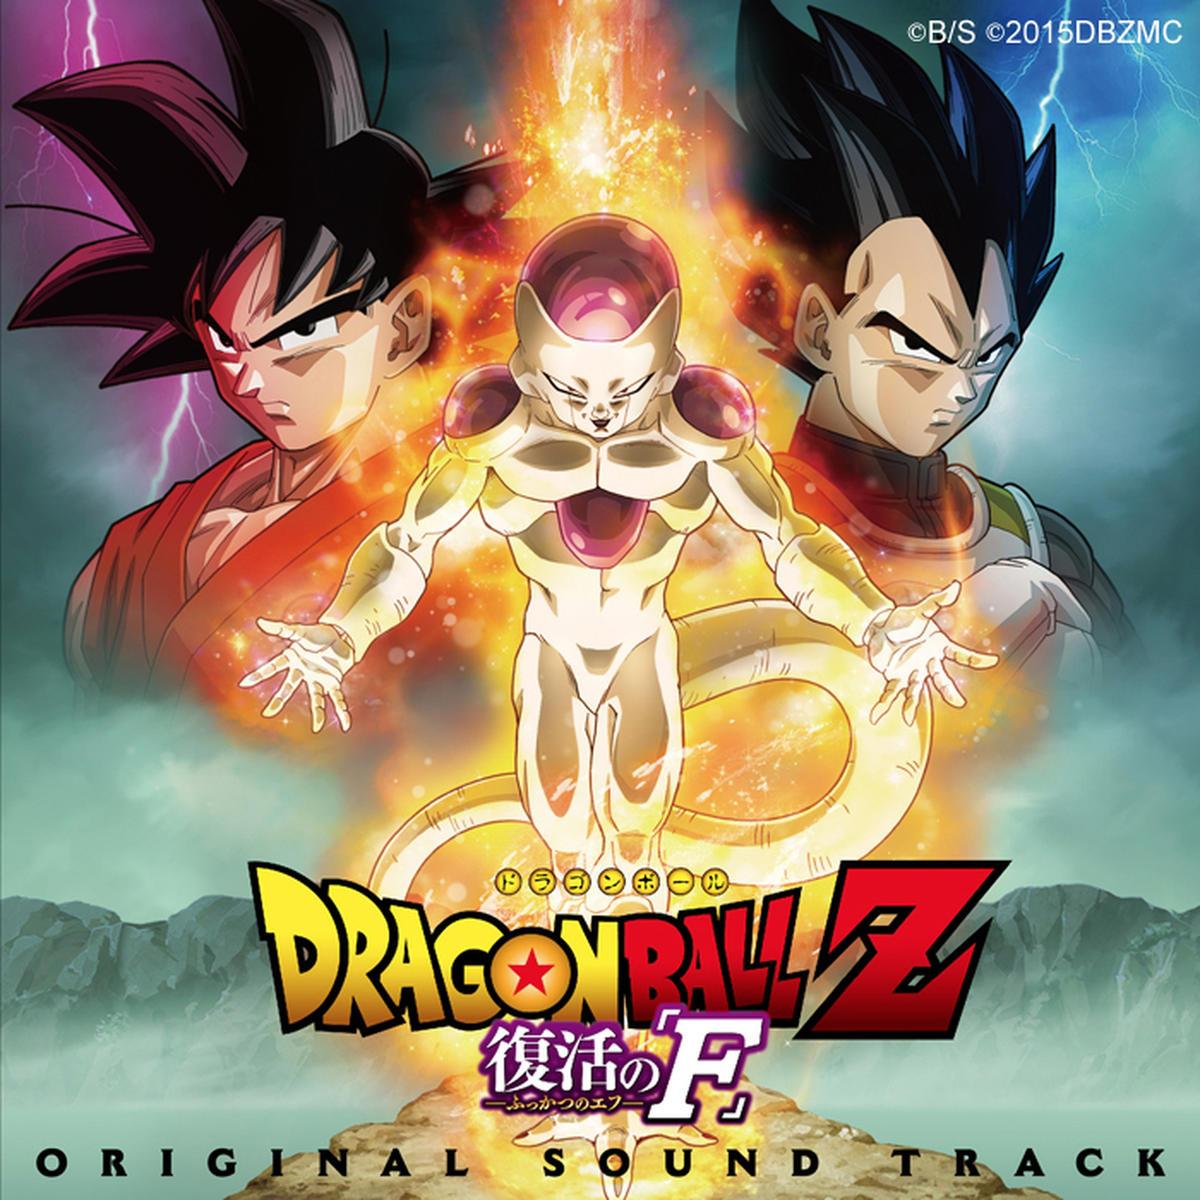 Dragonball Z Resurrection F